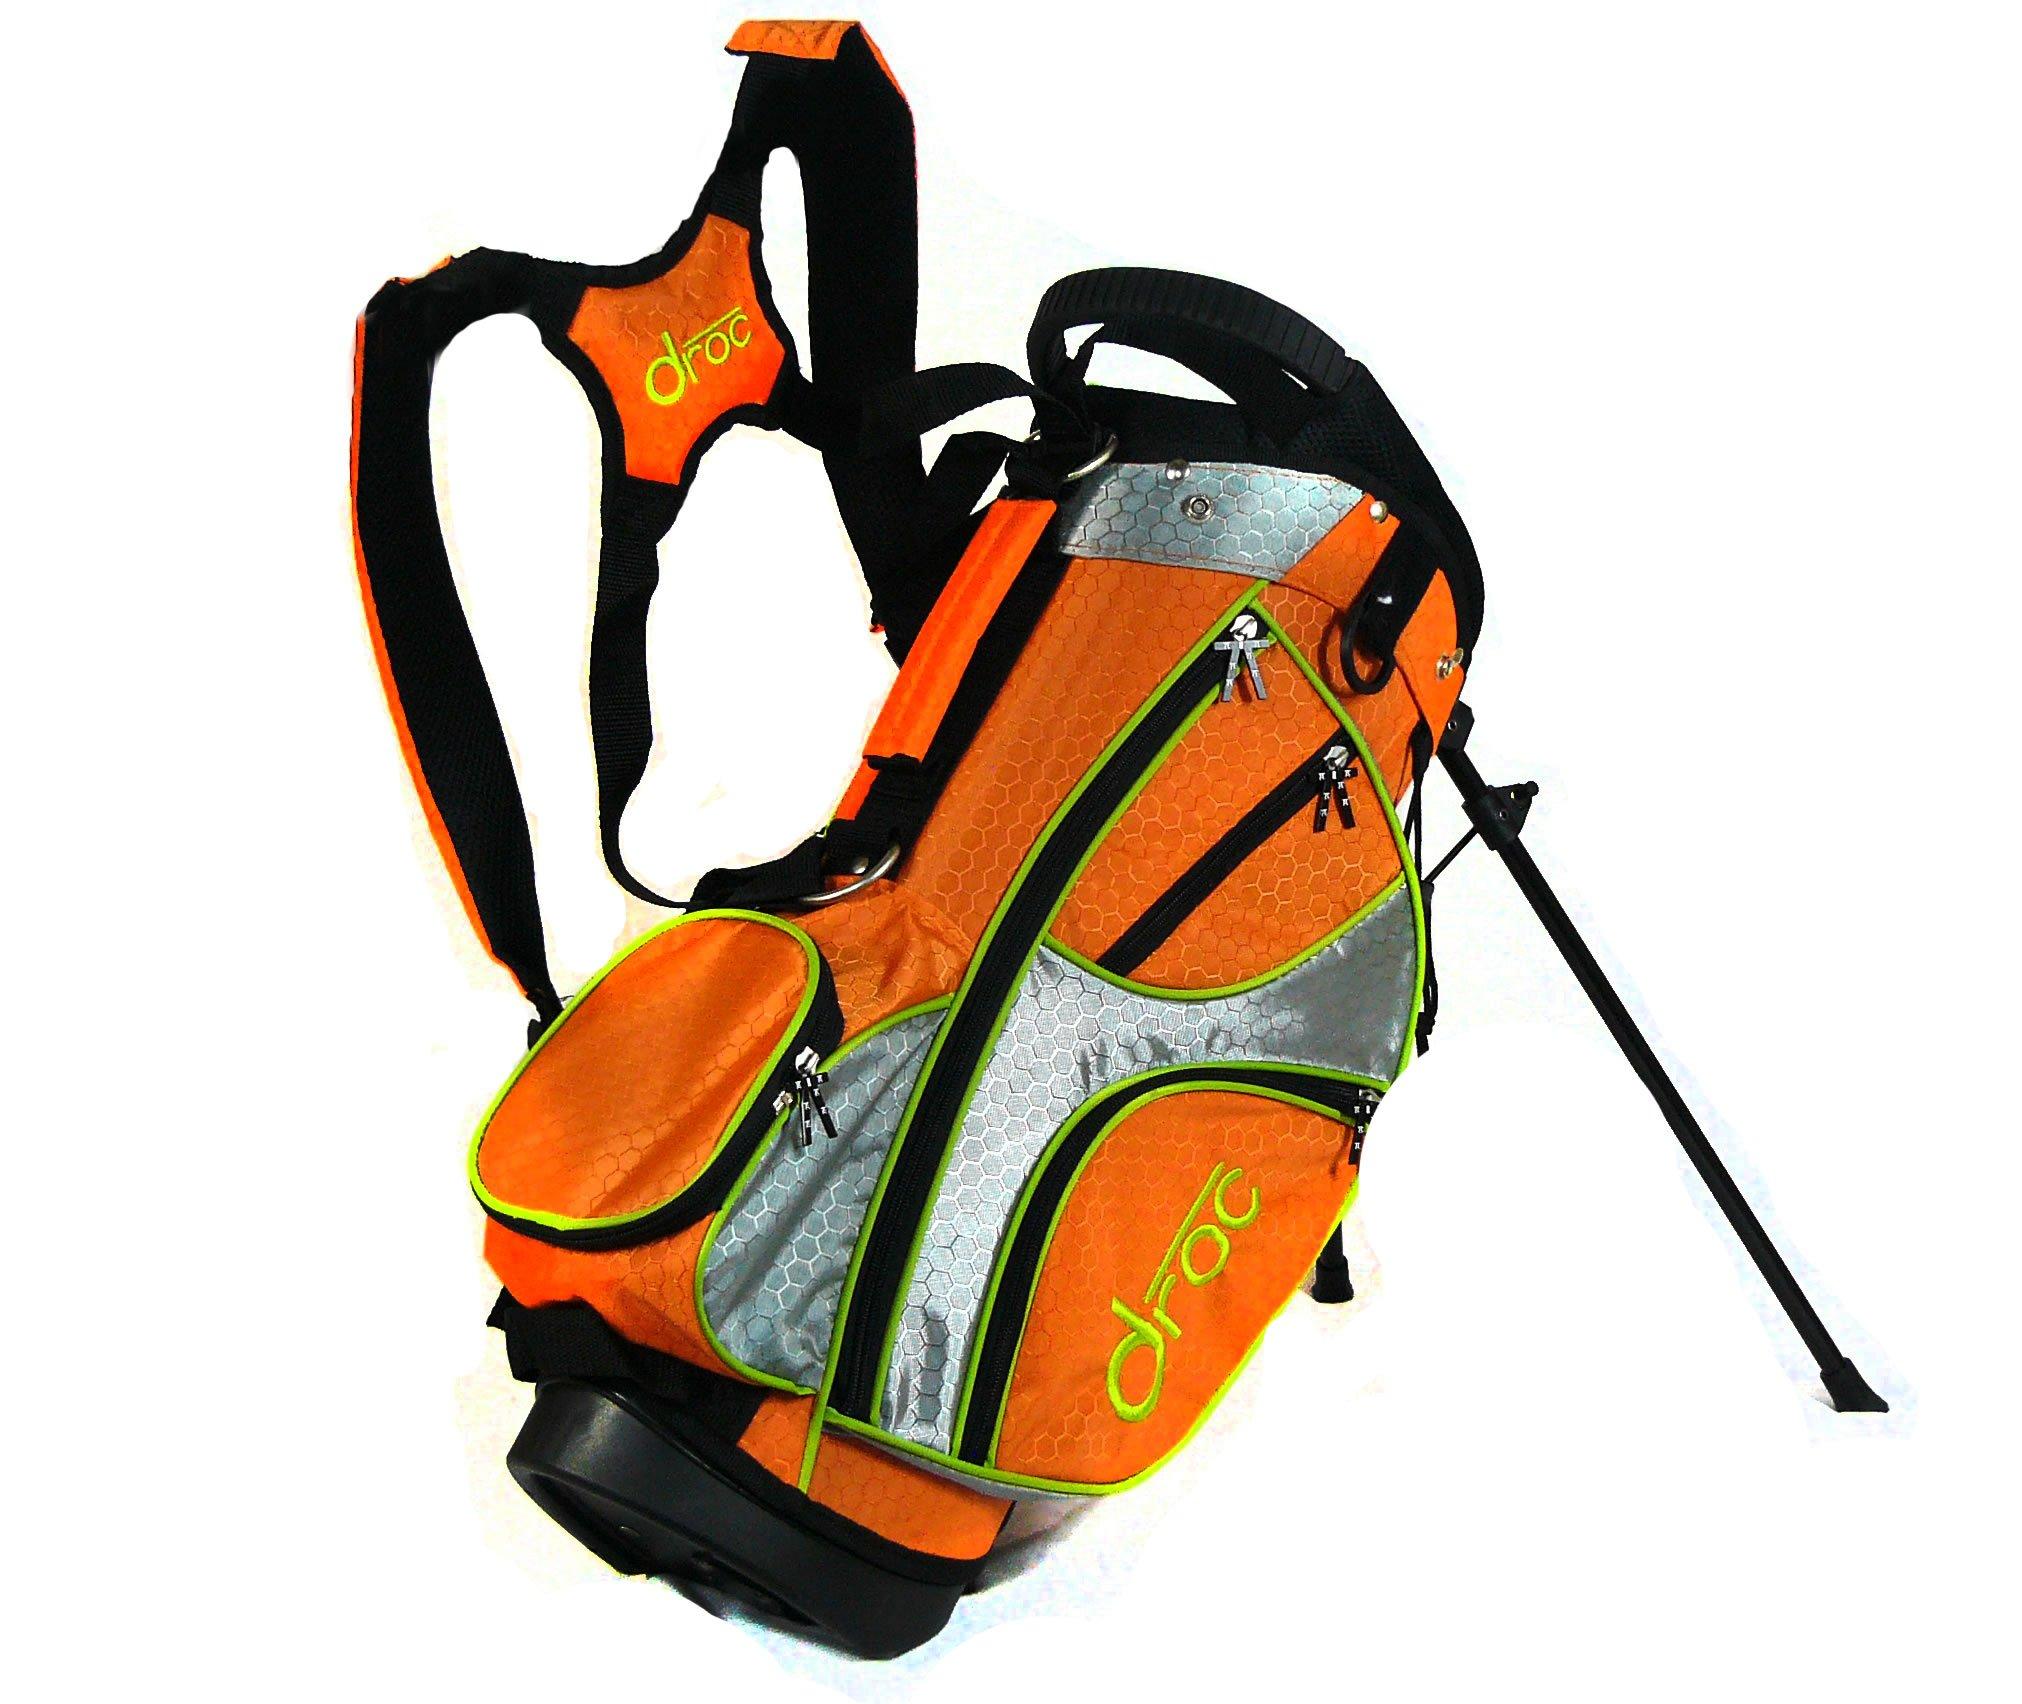 droc - Mica Left Handed Series 7 Pieces Golf Club Set & Golf Bag Ages 3-6 Left Handed (Titanium, Regular) by droc (Image #8)